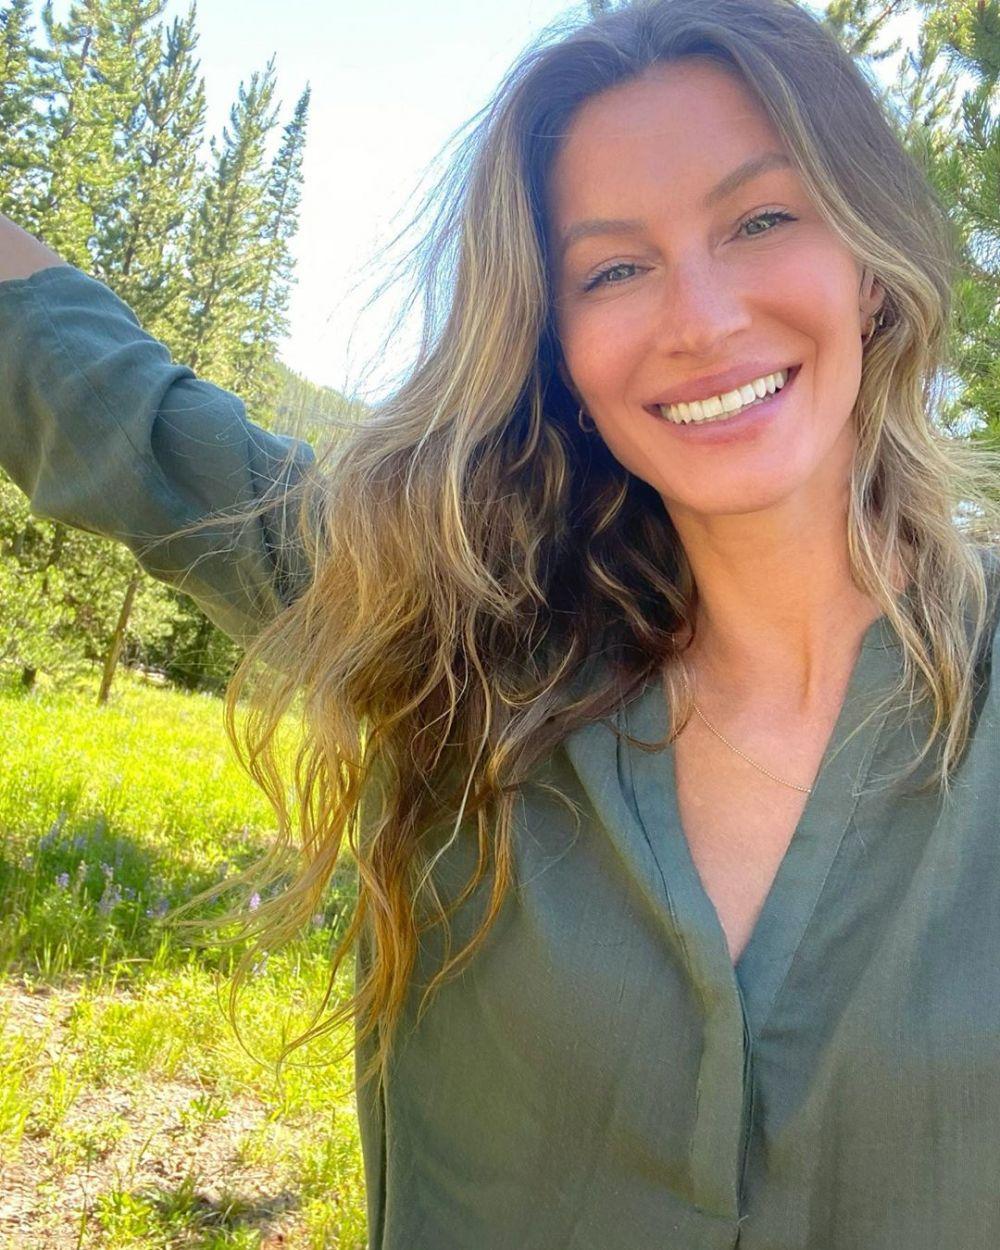 Rahasia Awet Muda, 7 Seleb Hollywood Ini Gemar Lakukan Yoga